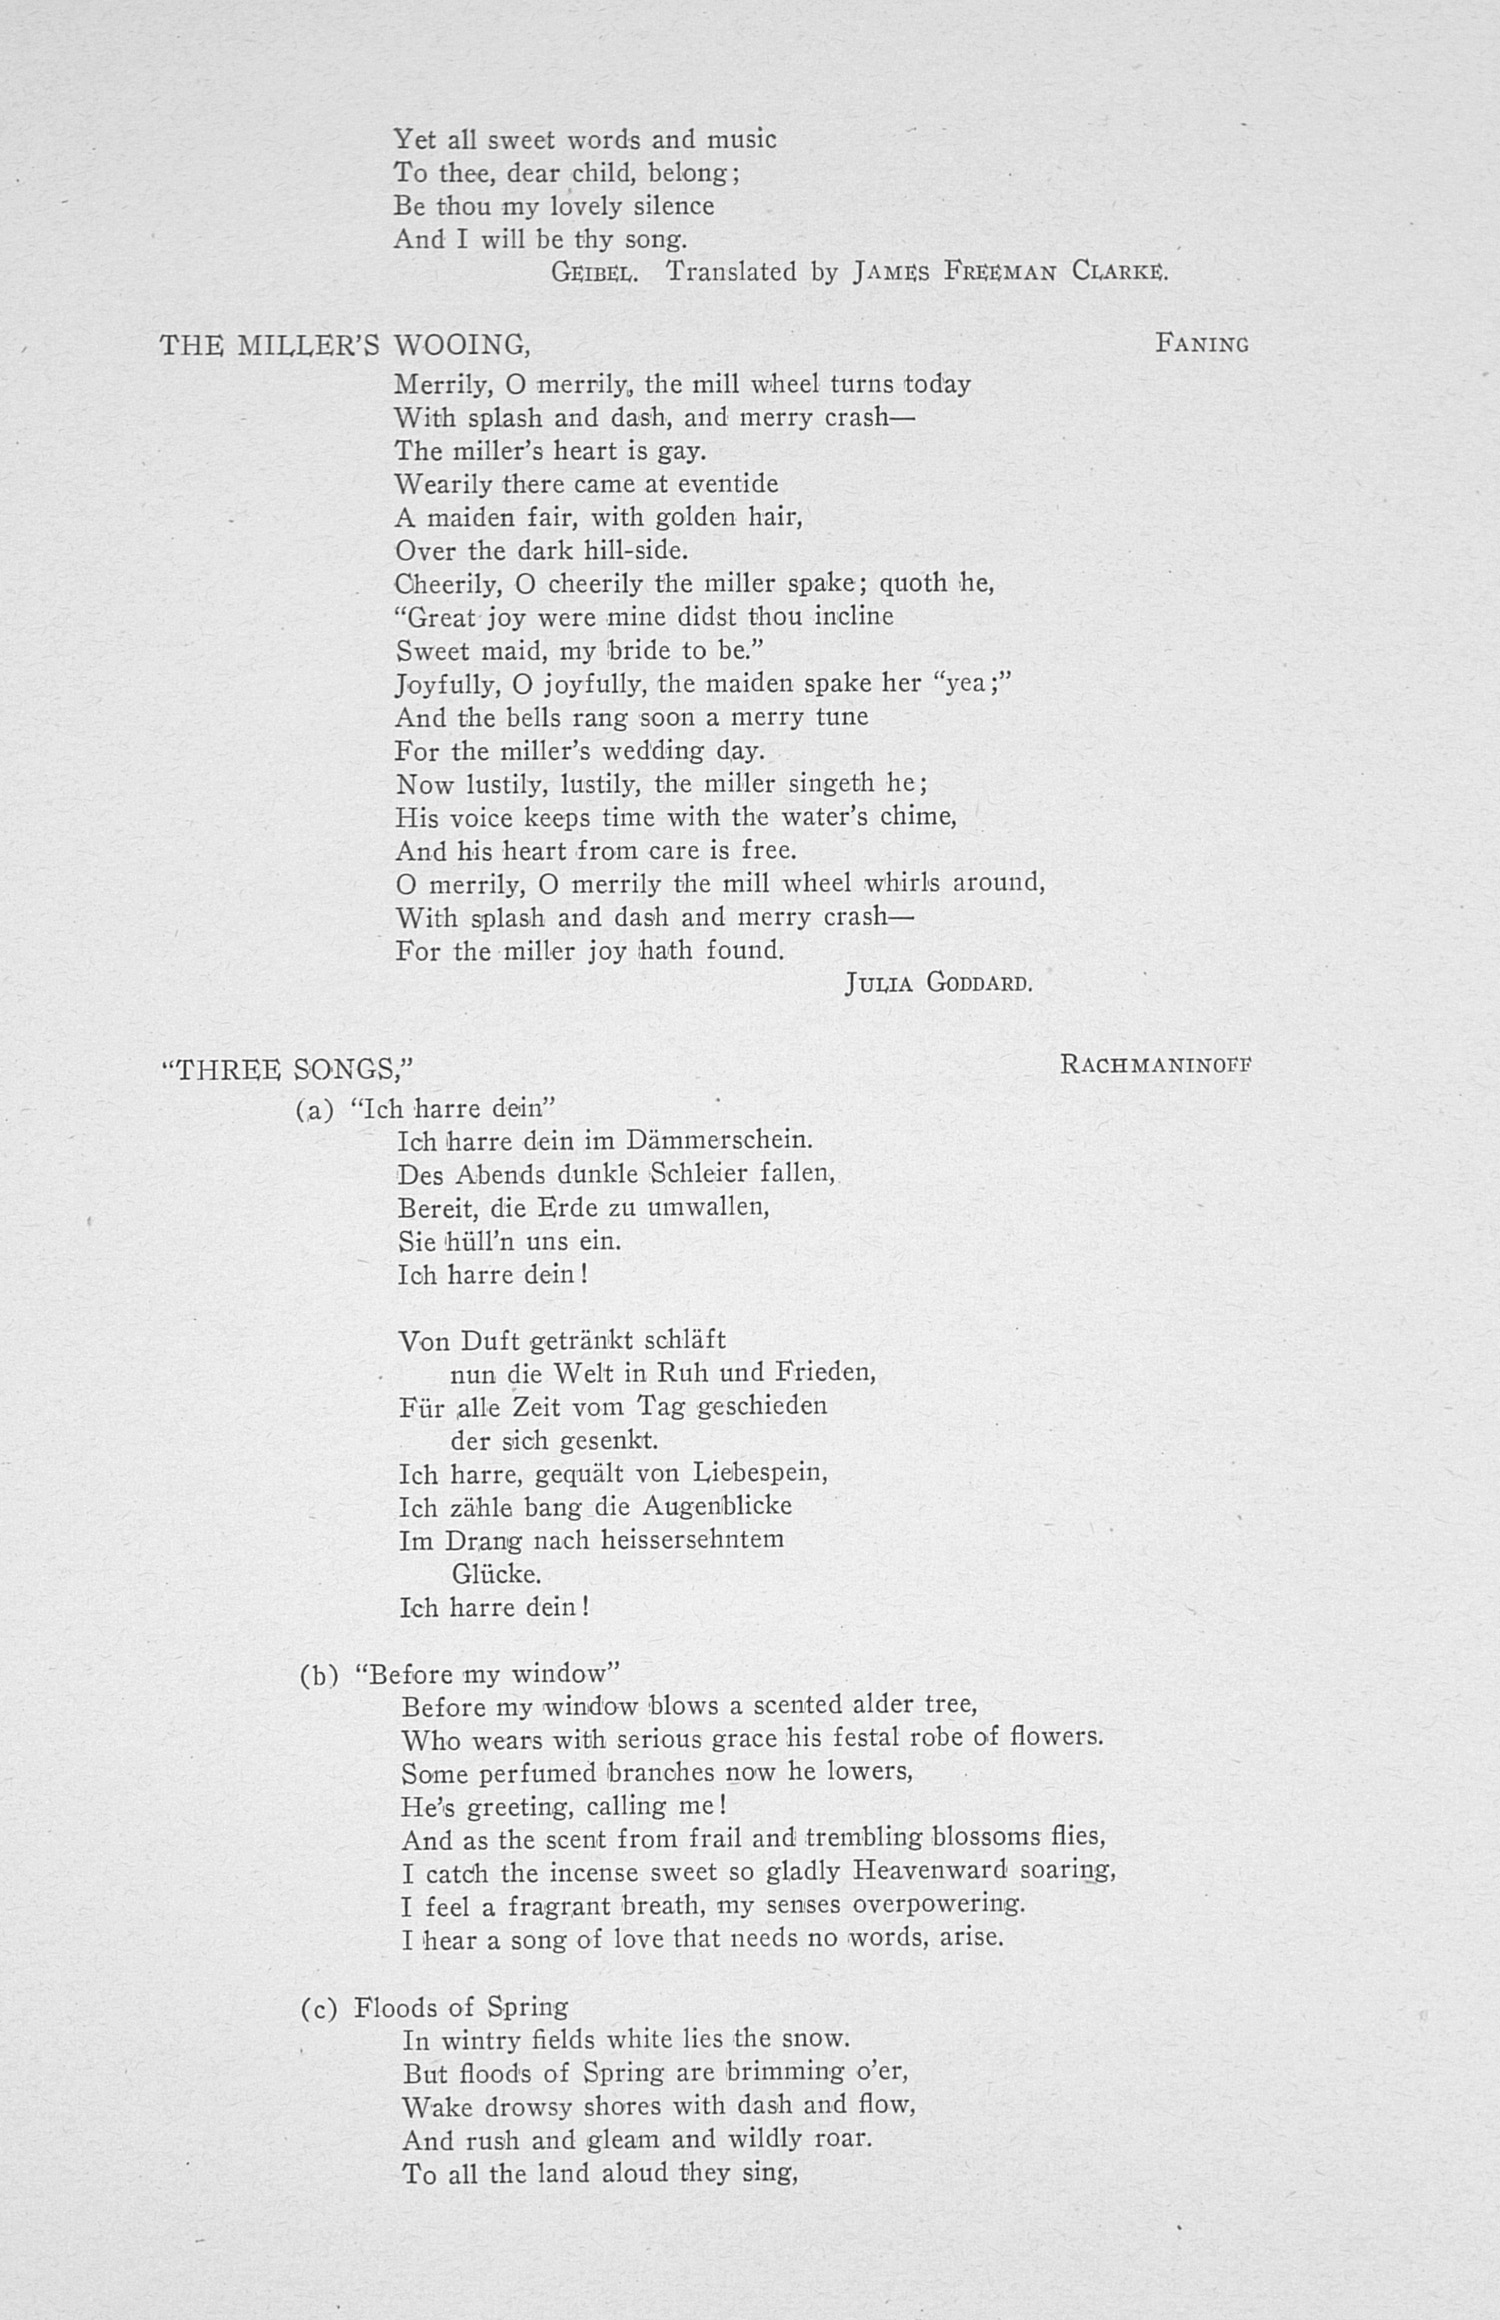 Ums concert program january 23 1914 choral union series ann ums concert program january 23 1914 choral union series m4hsunfo